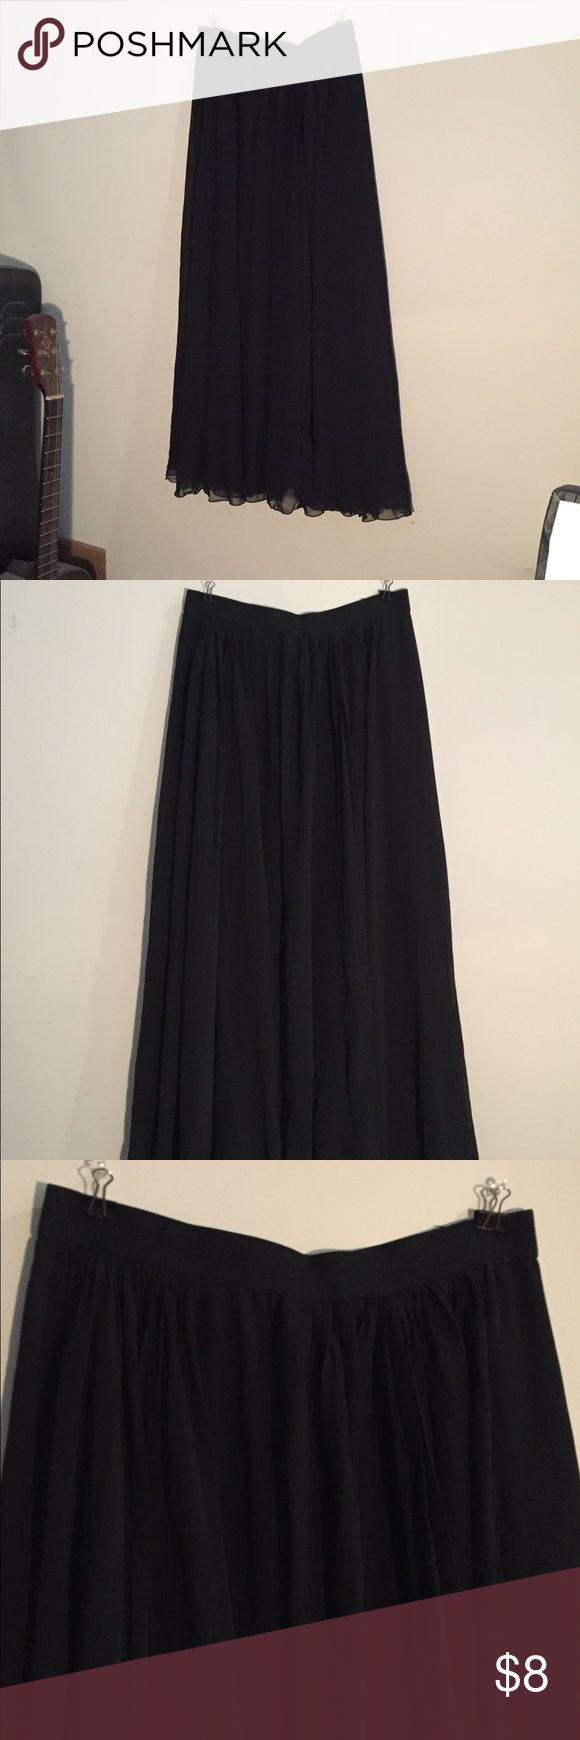 Small Uniqlo High waist black skirt Small black maxi skirt.   26-27 inch waist.  Fits small! Uniqlo Skirts Maxi